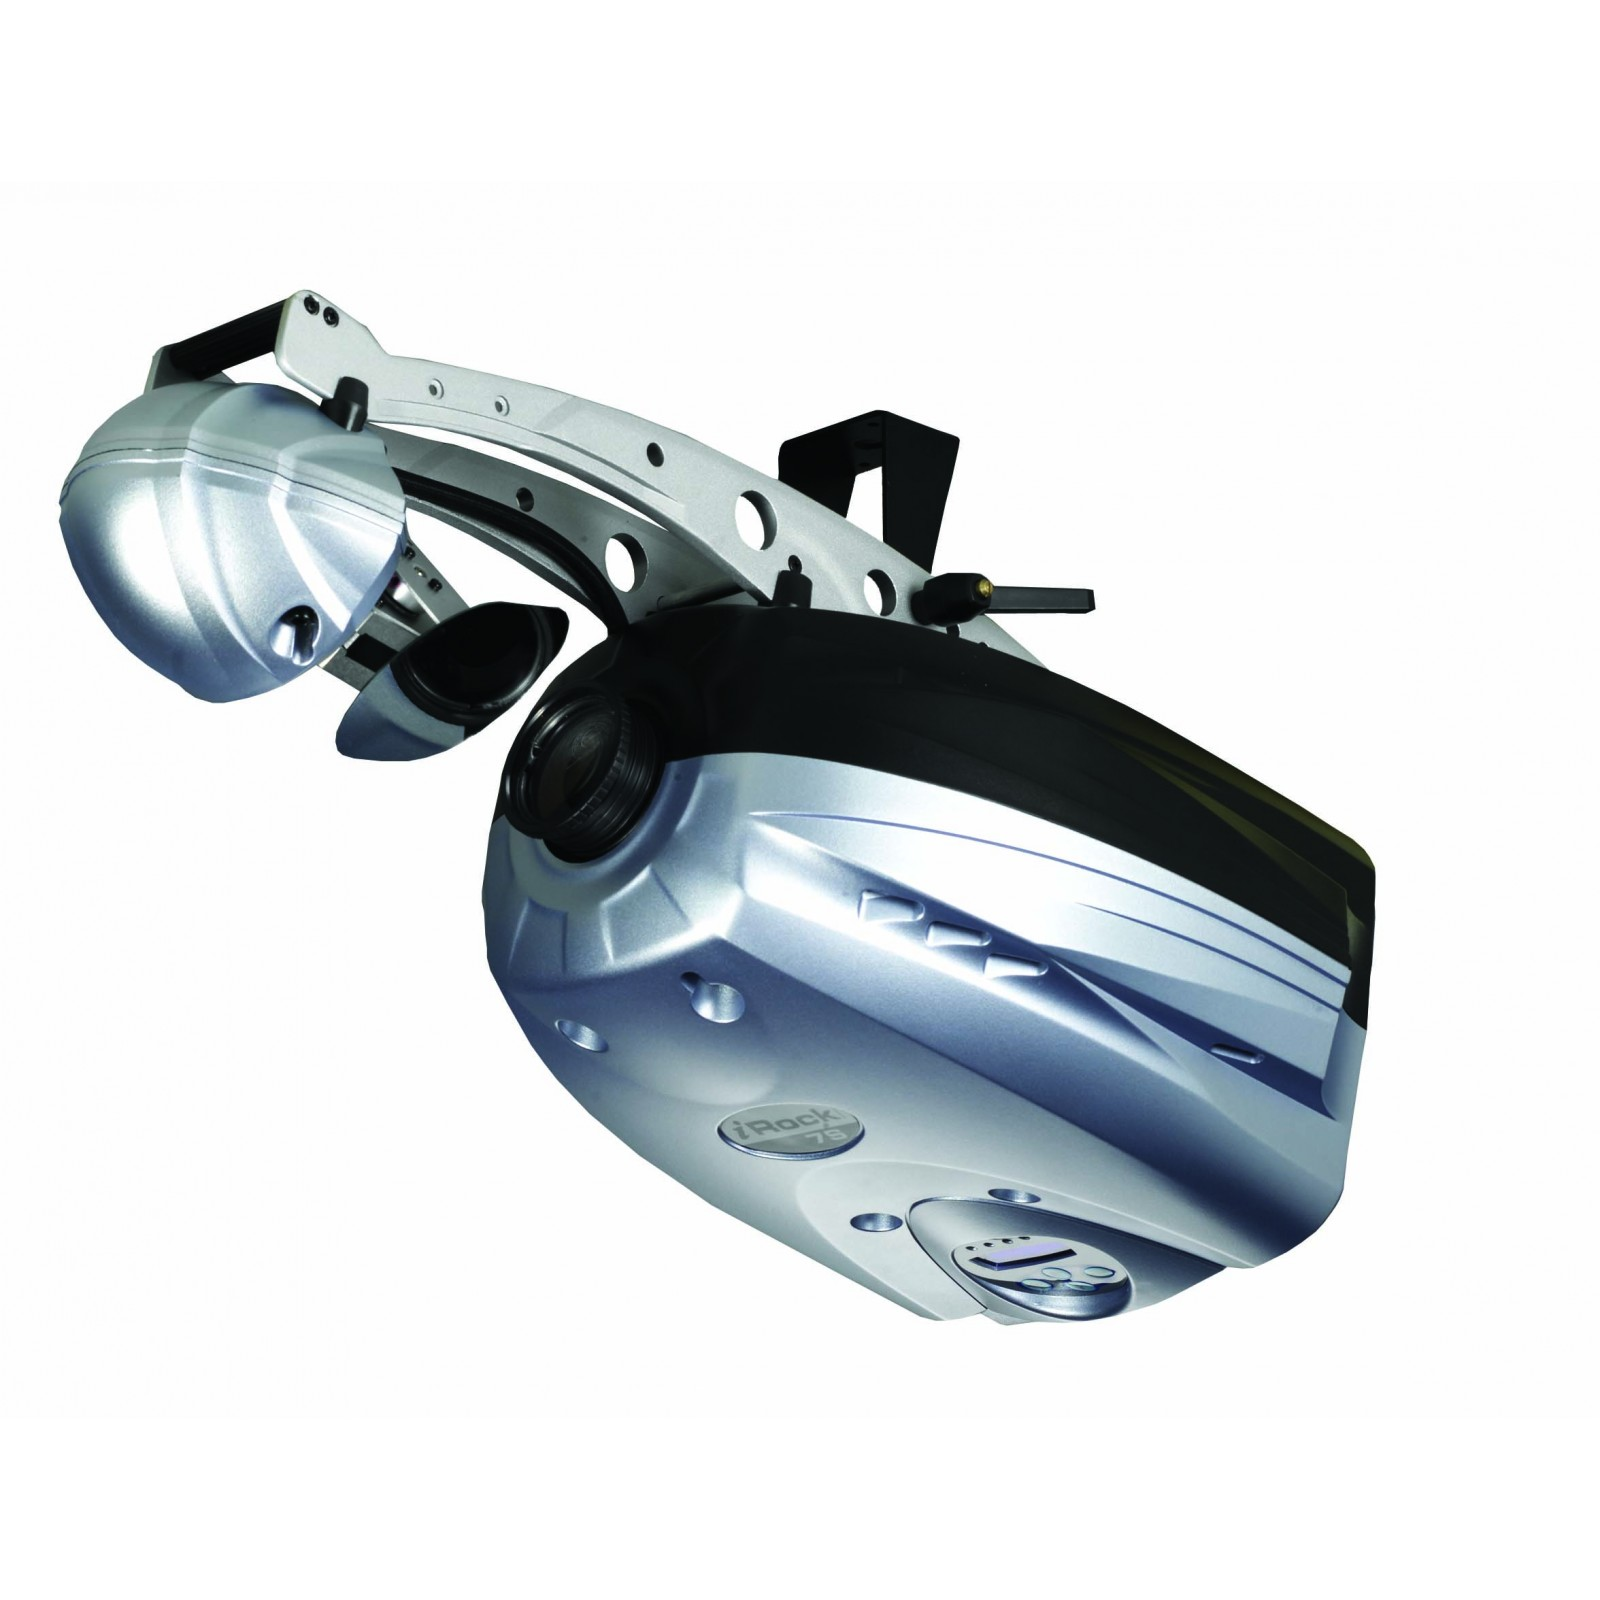 jb systems irock 7s stage lighting scanners. Black Bedroom Furniture Sets. Home Design Ideas